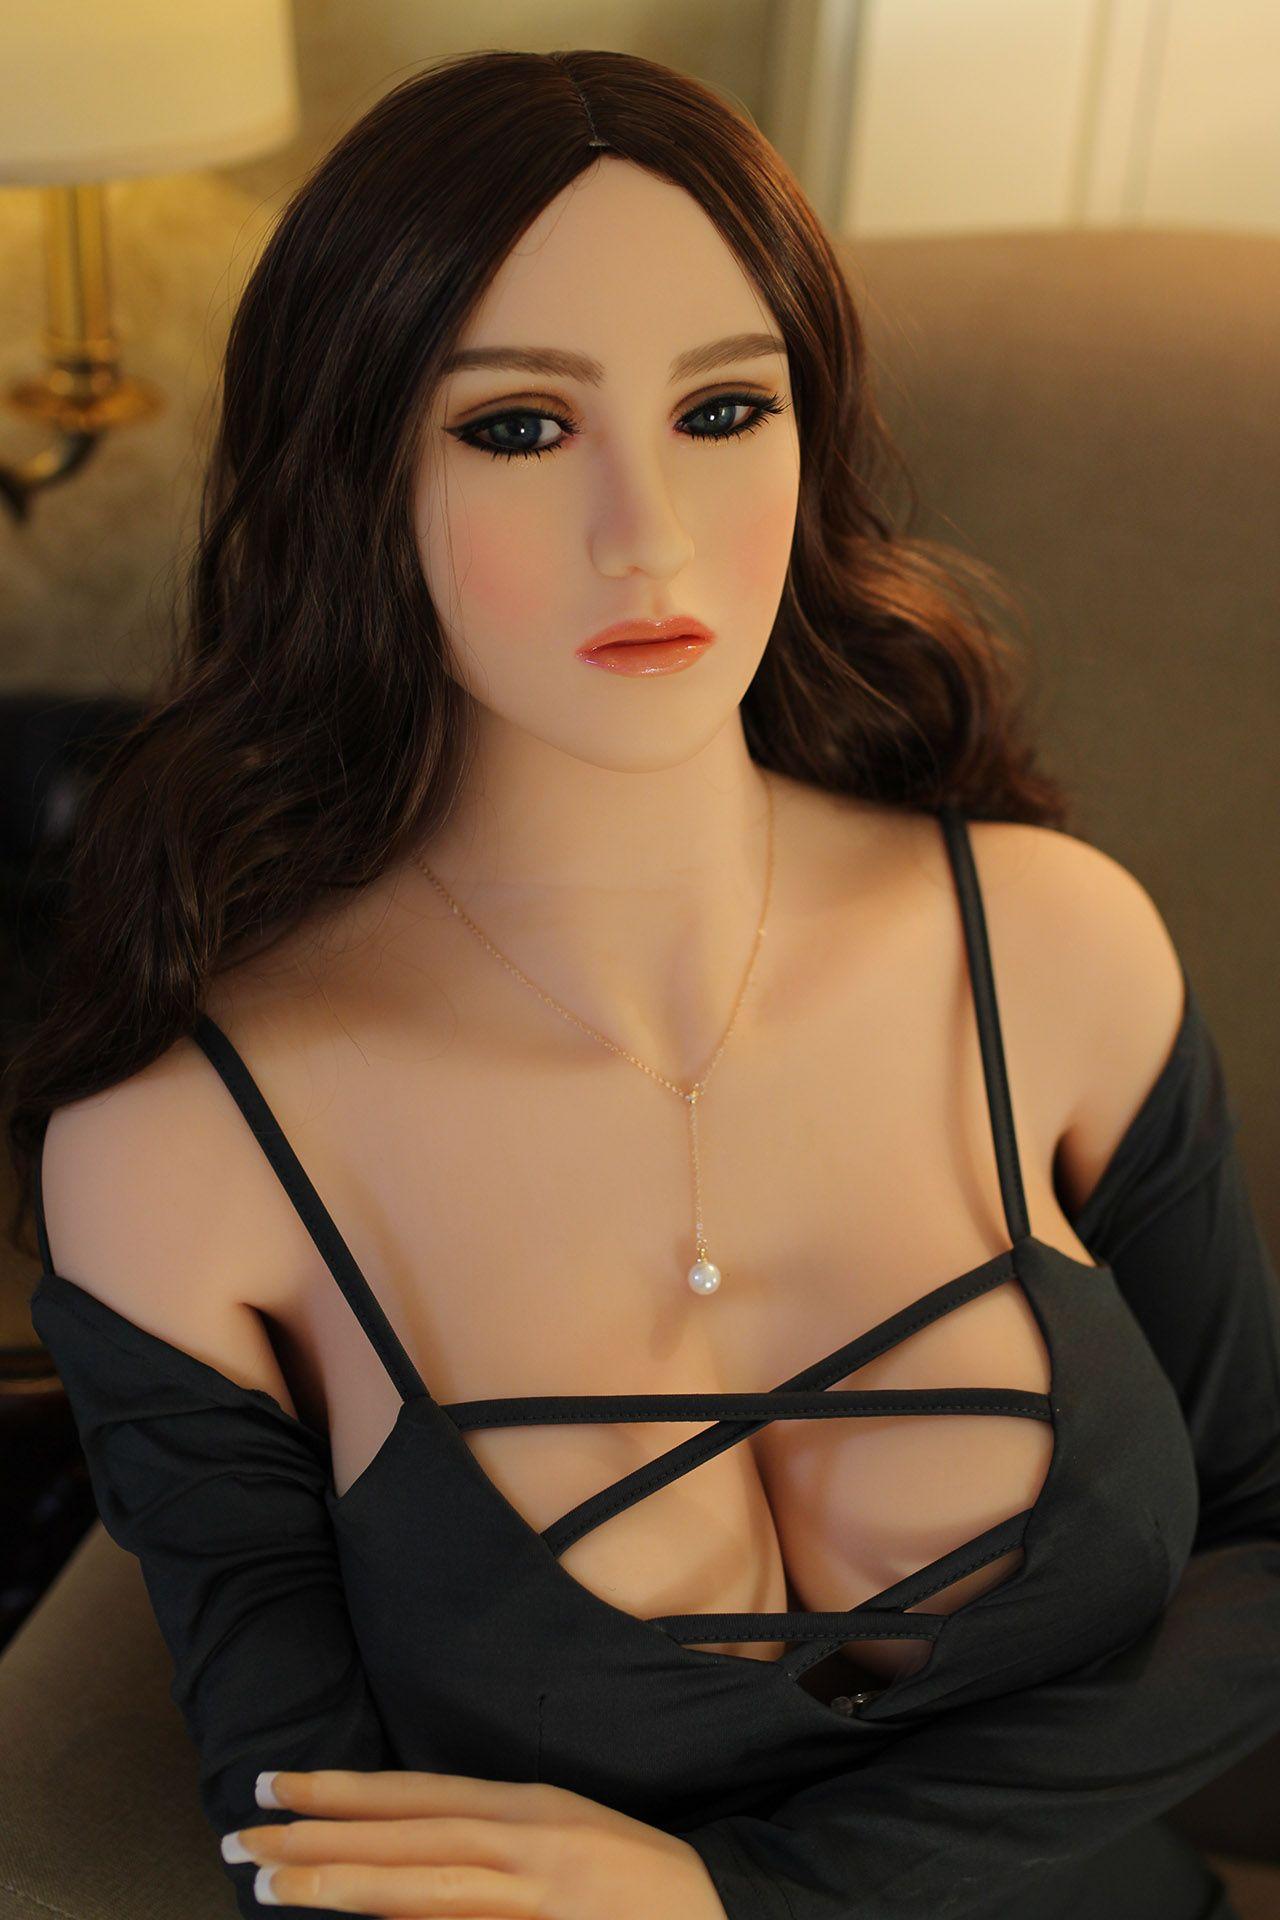 165cm Full Body Sex Doll Metal Skeleton Real Love Doll Anal Vagina Oral Male Masturbator Sex Toys for Women